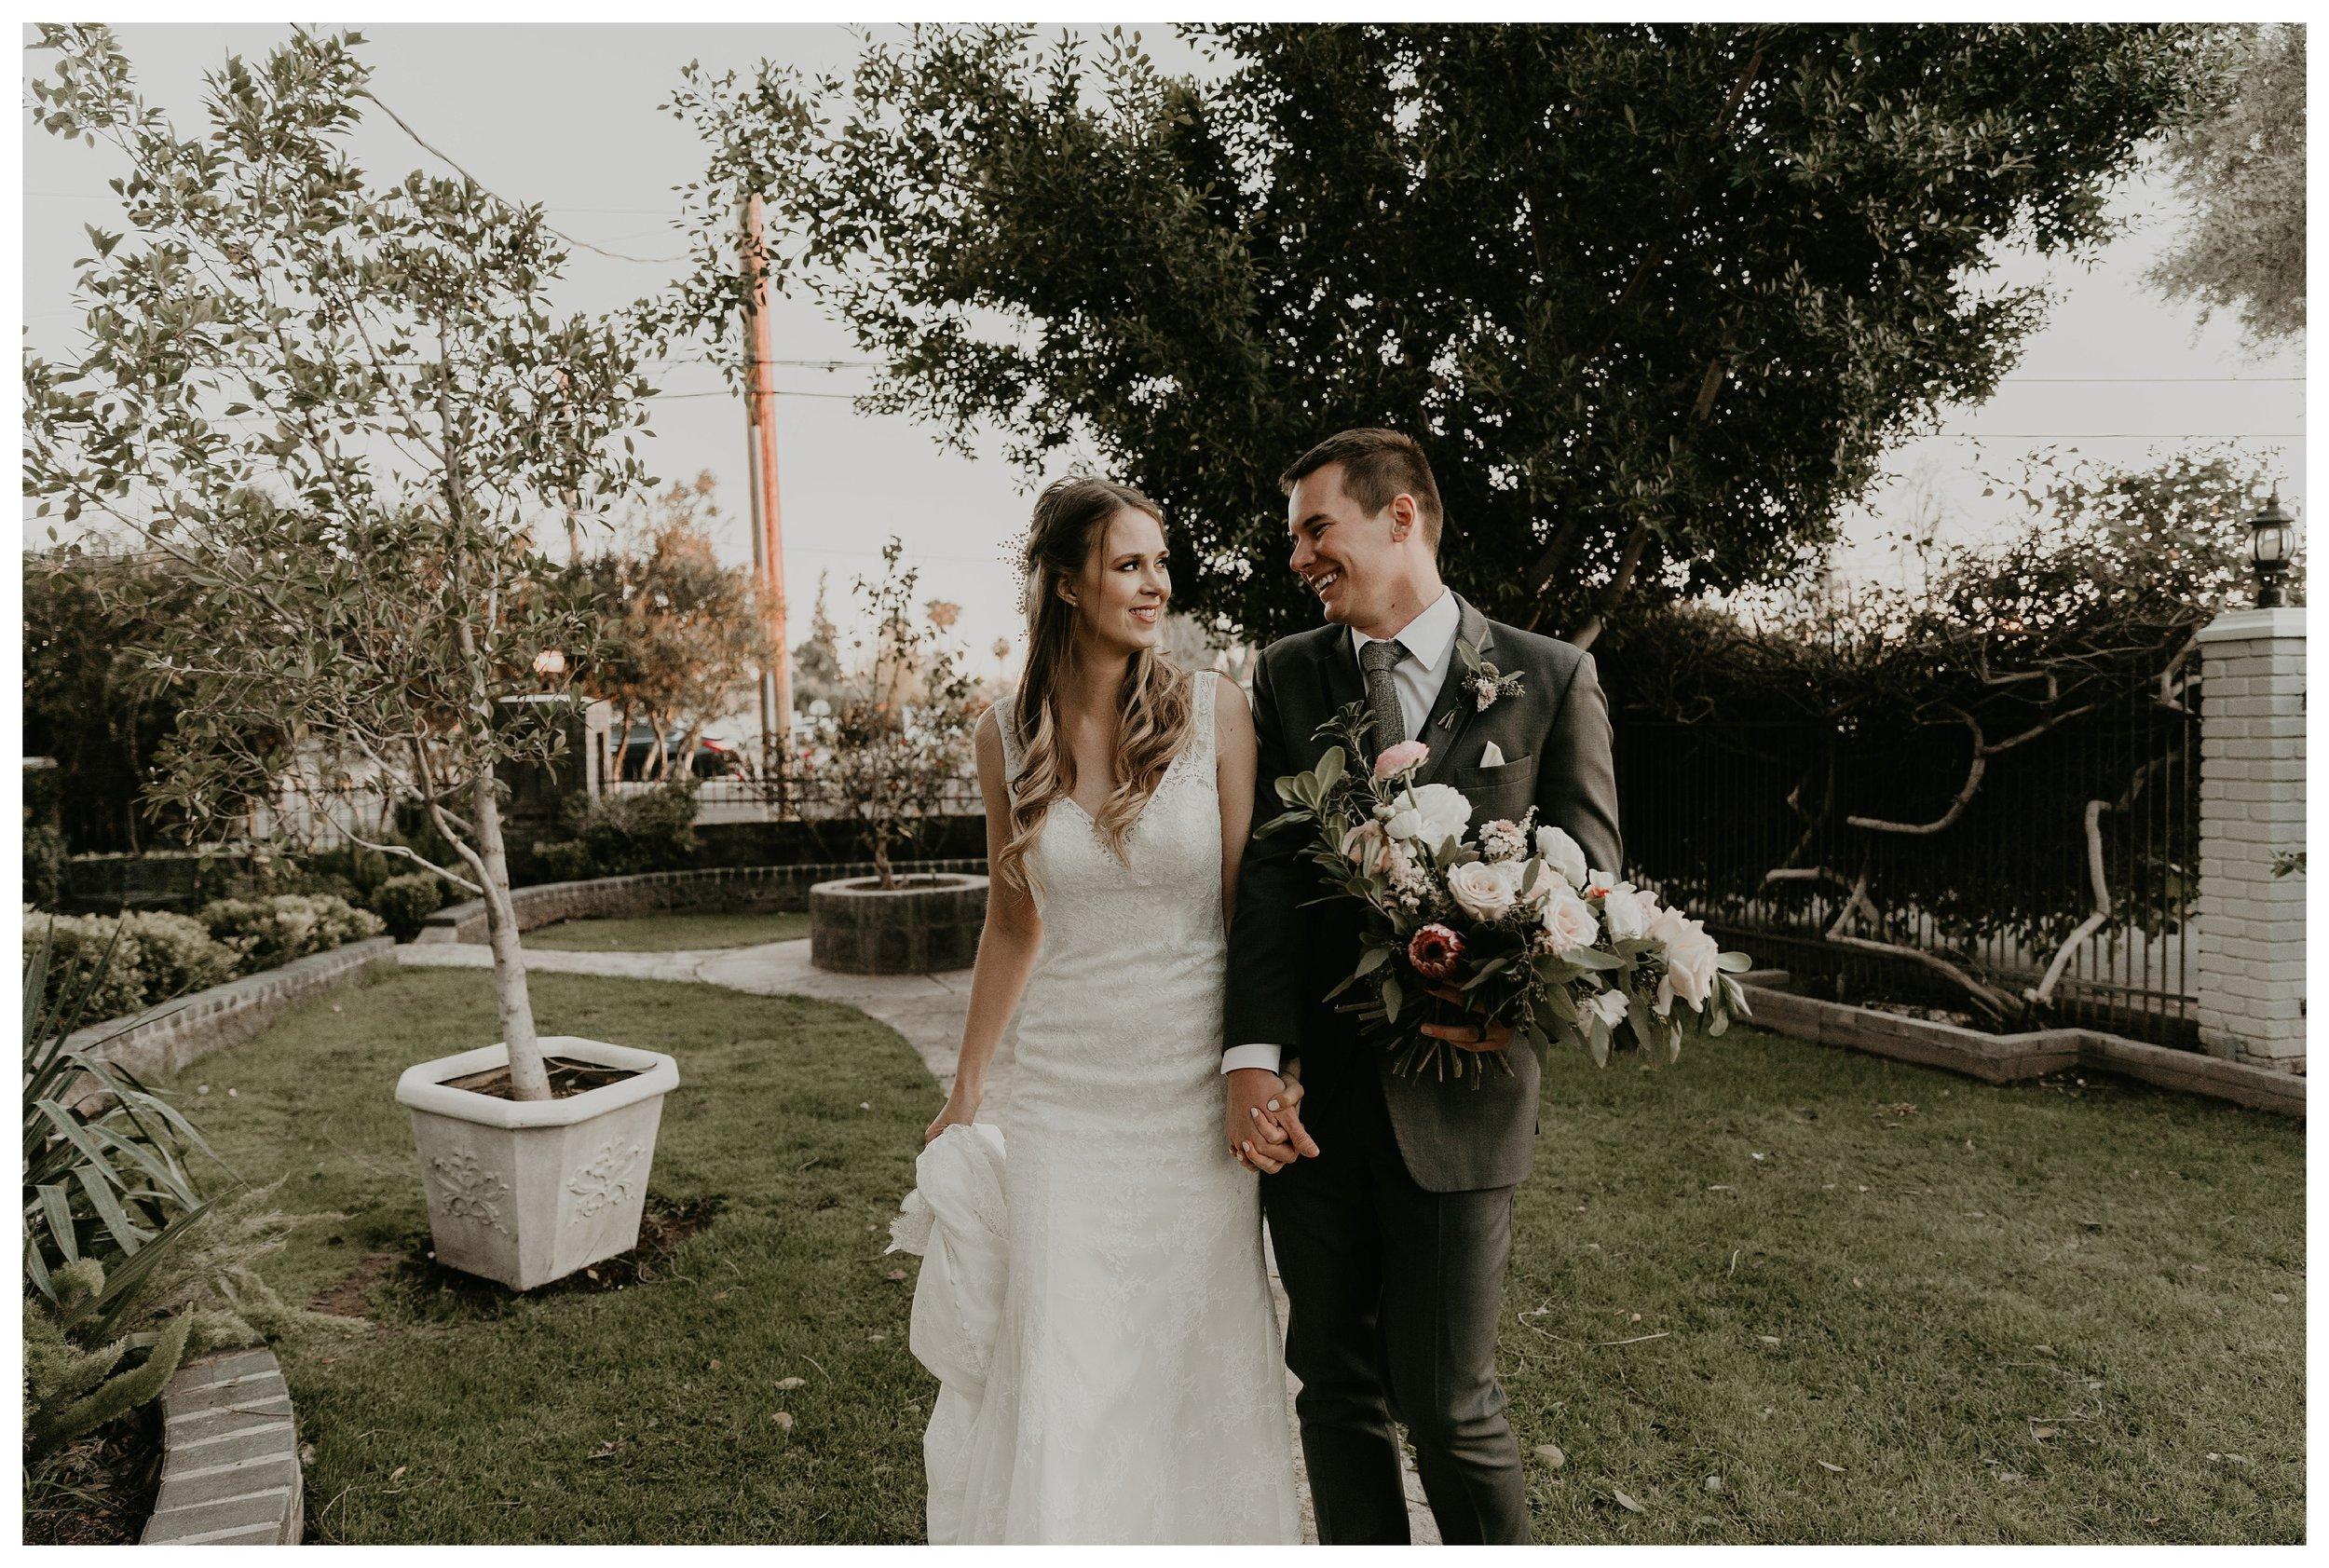 Wright house wedding bride and groom photos